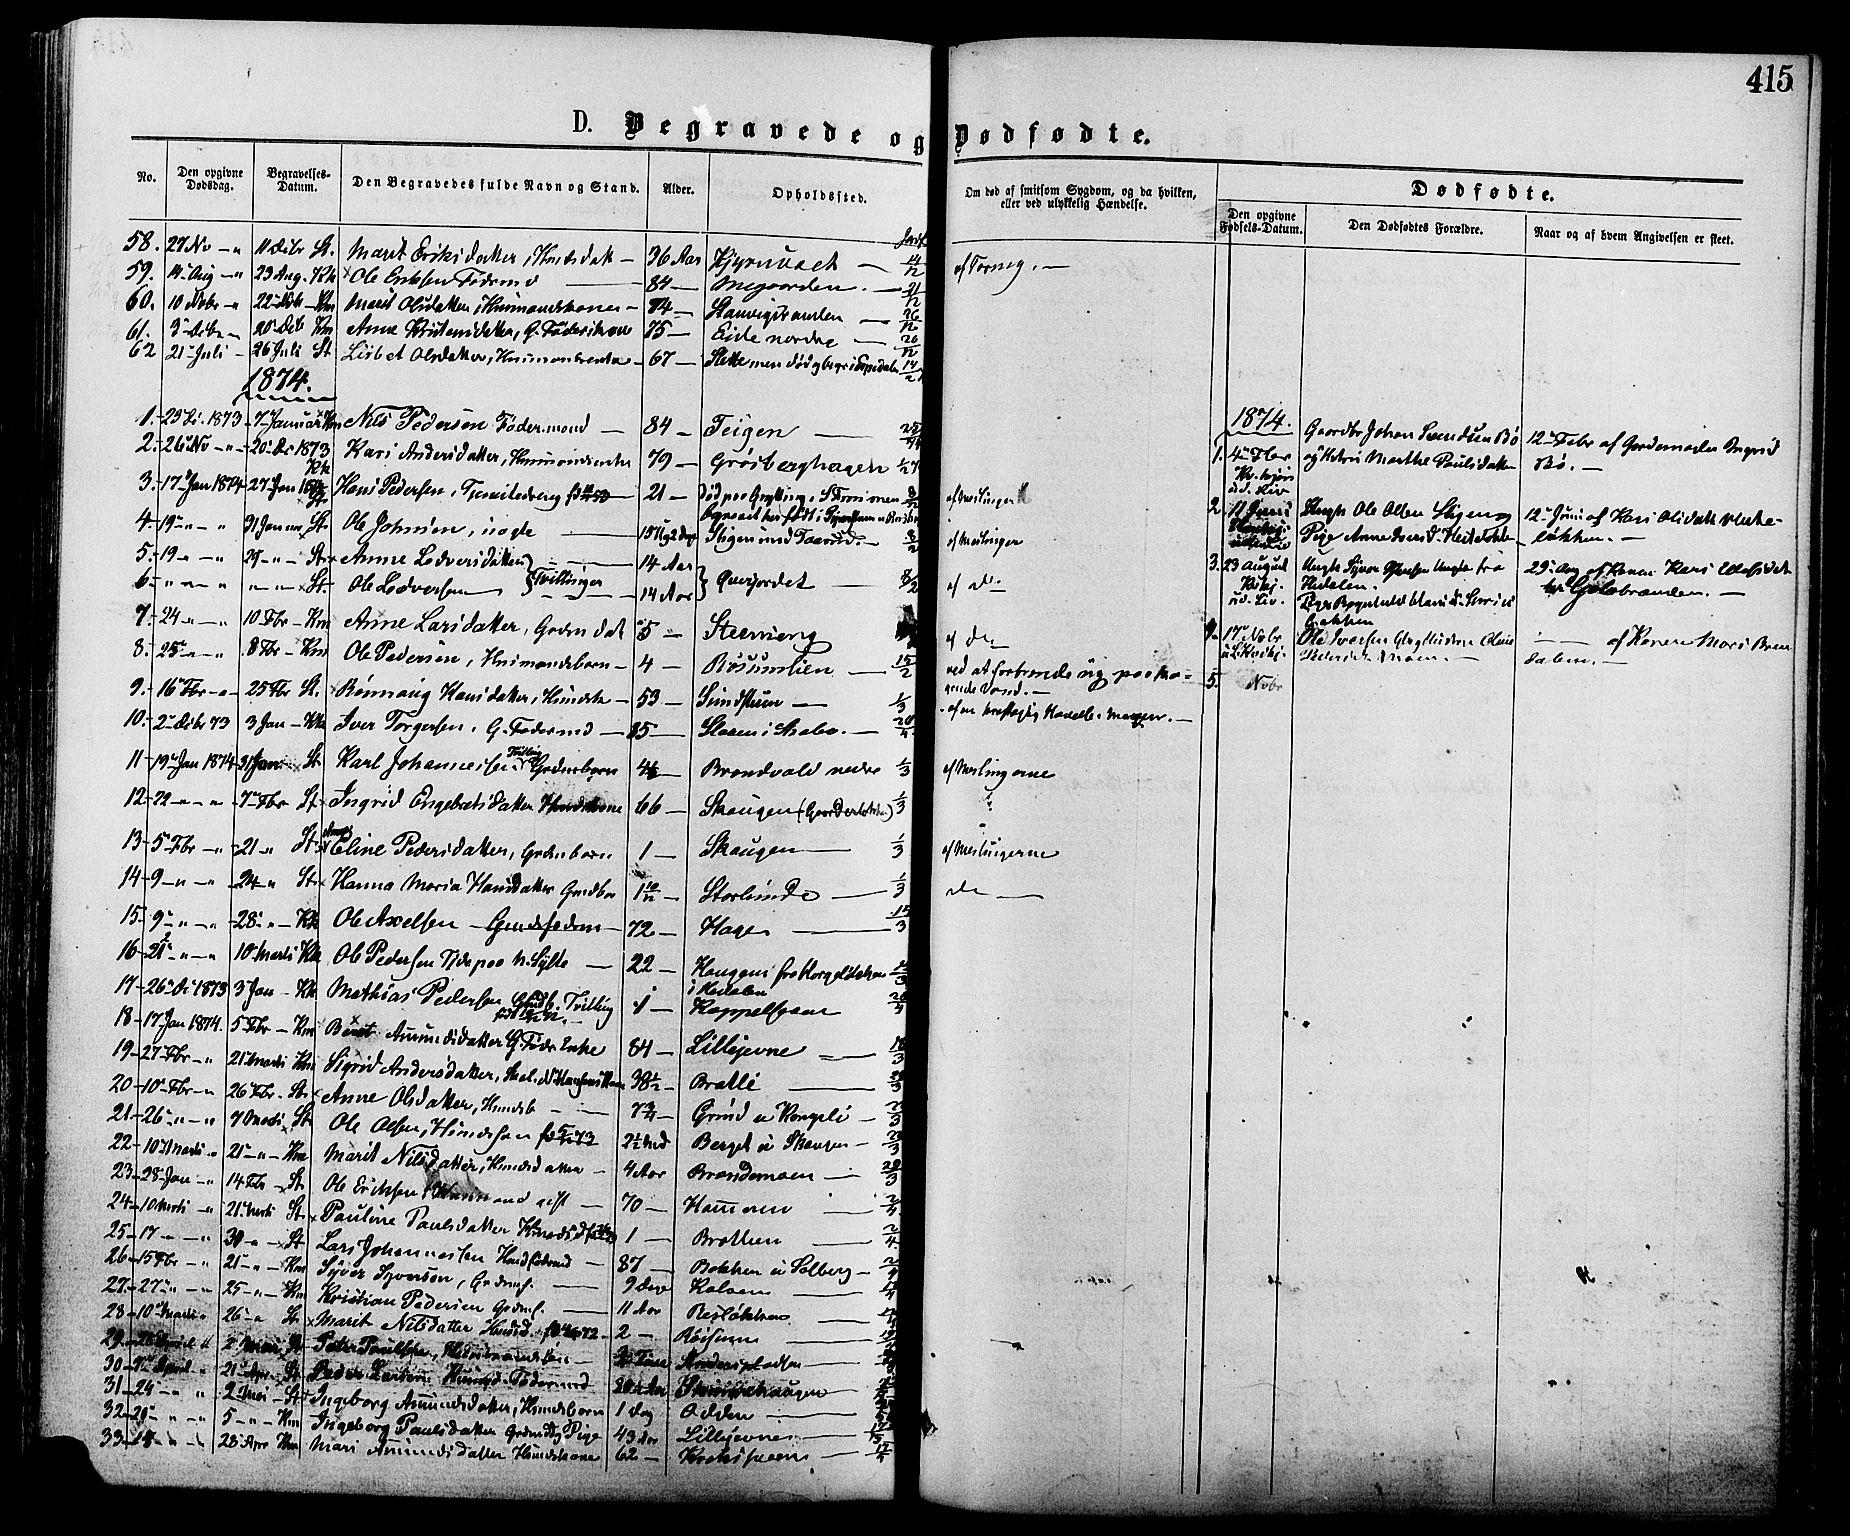 SAH, Nord-Fron prestekontor, Ministerialbok nr. 2, 1865-1883, s. 415